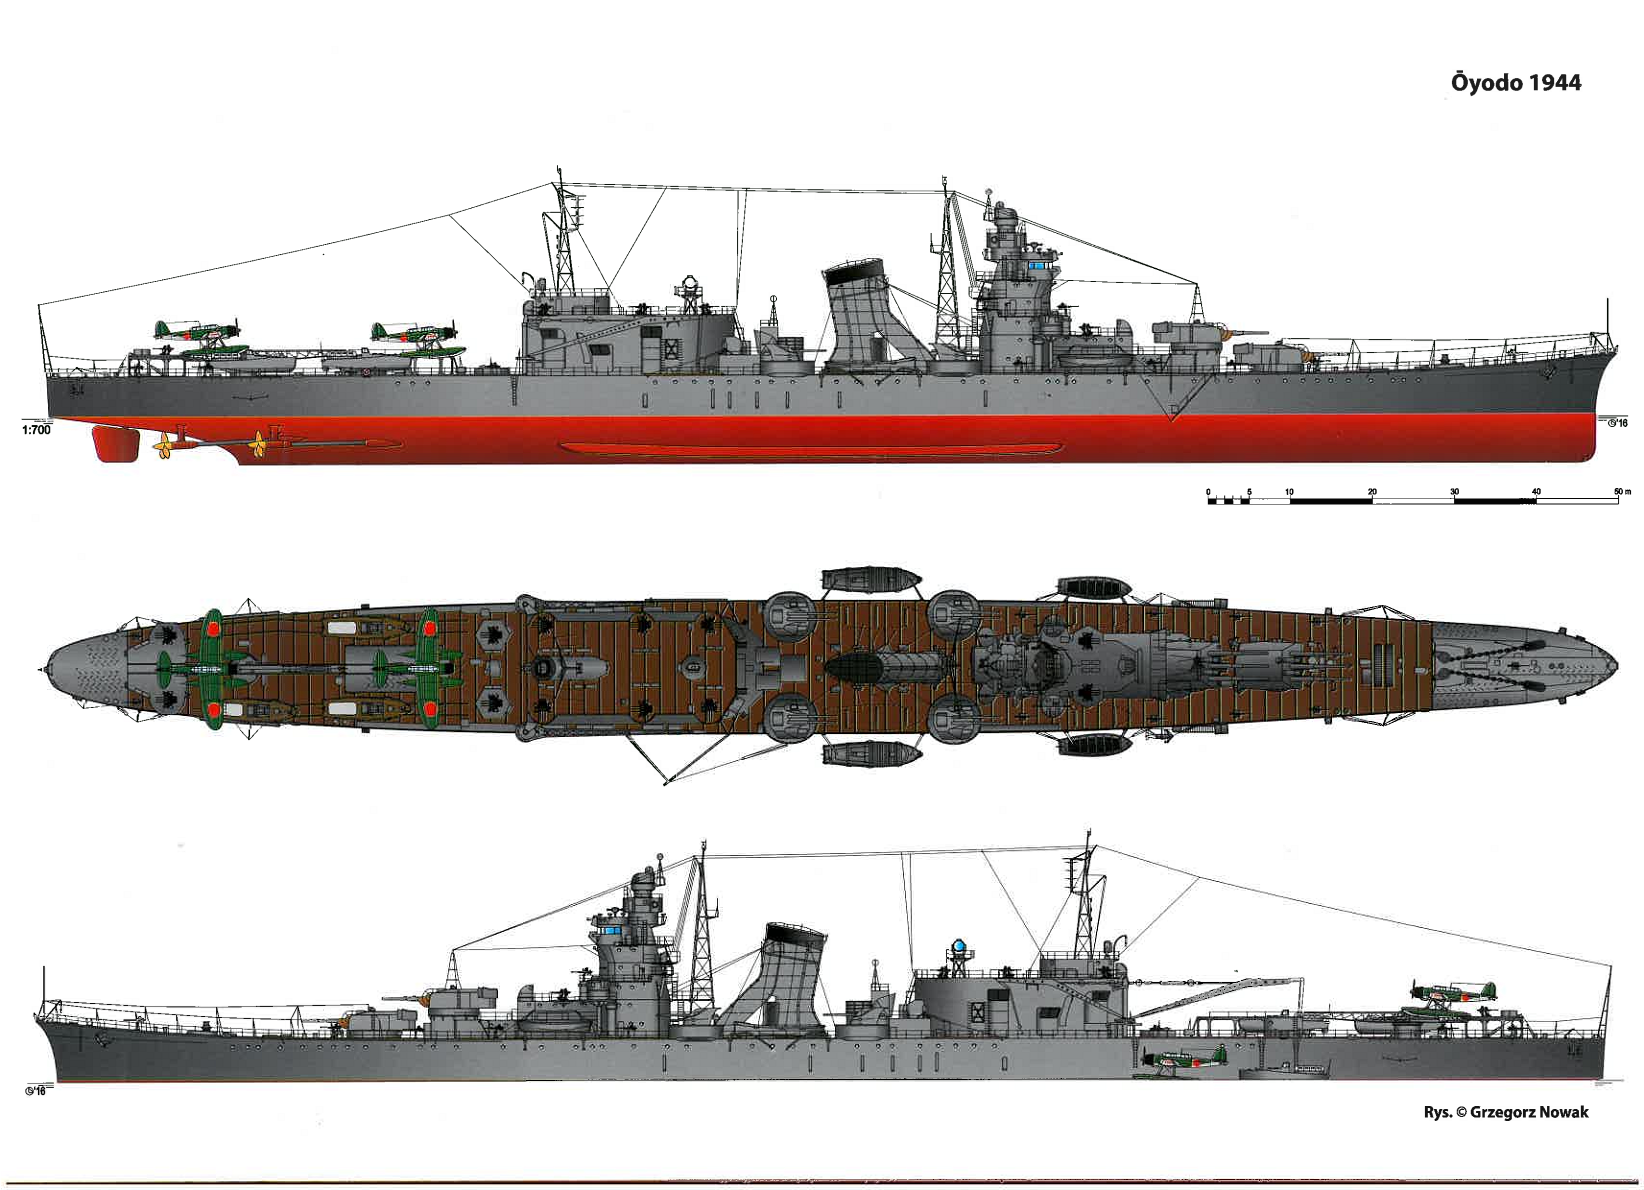 ijn light cruiser oyodo soviet navy heavy cruiser imperial japanese navy [ 1644 x 1190 Pixel ]